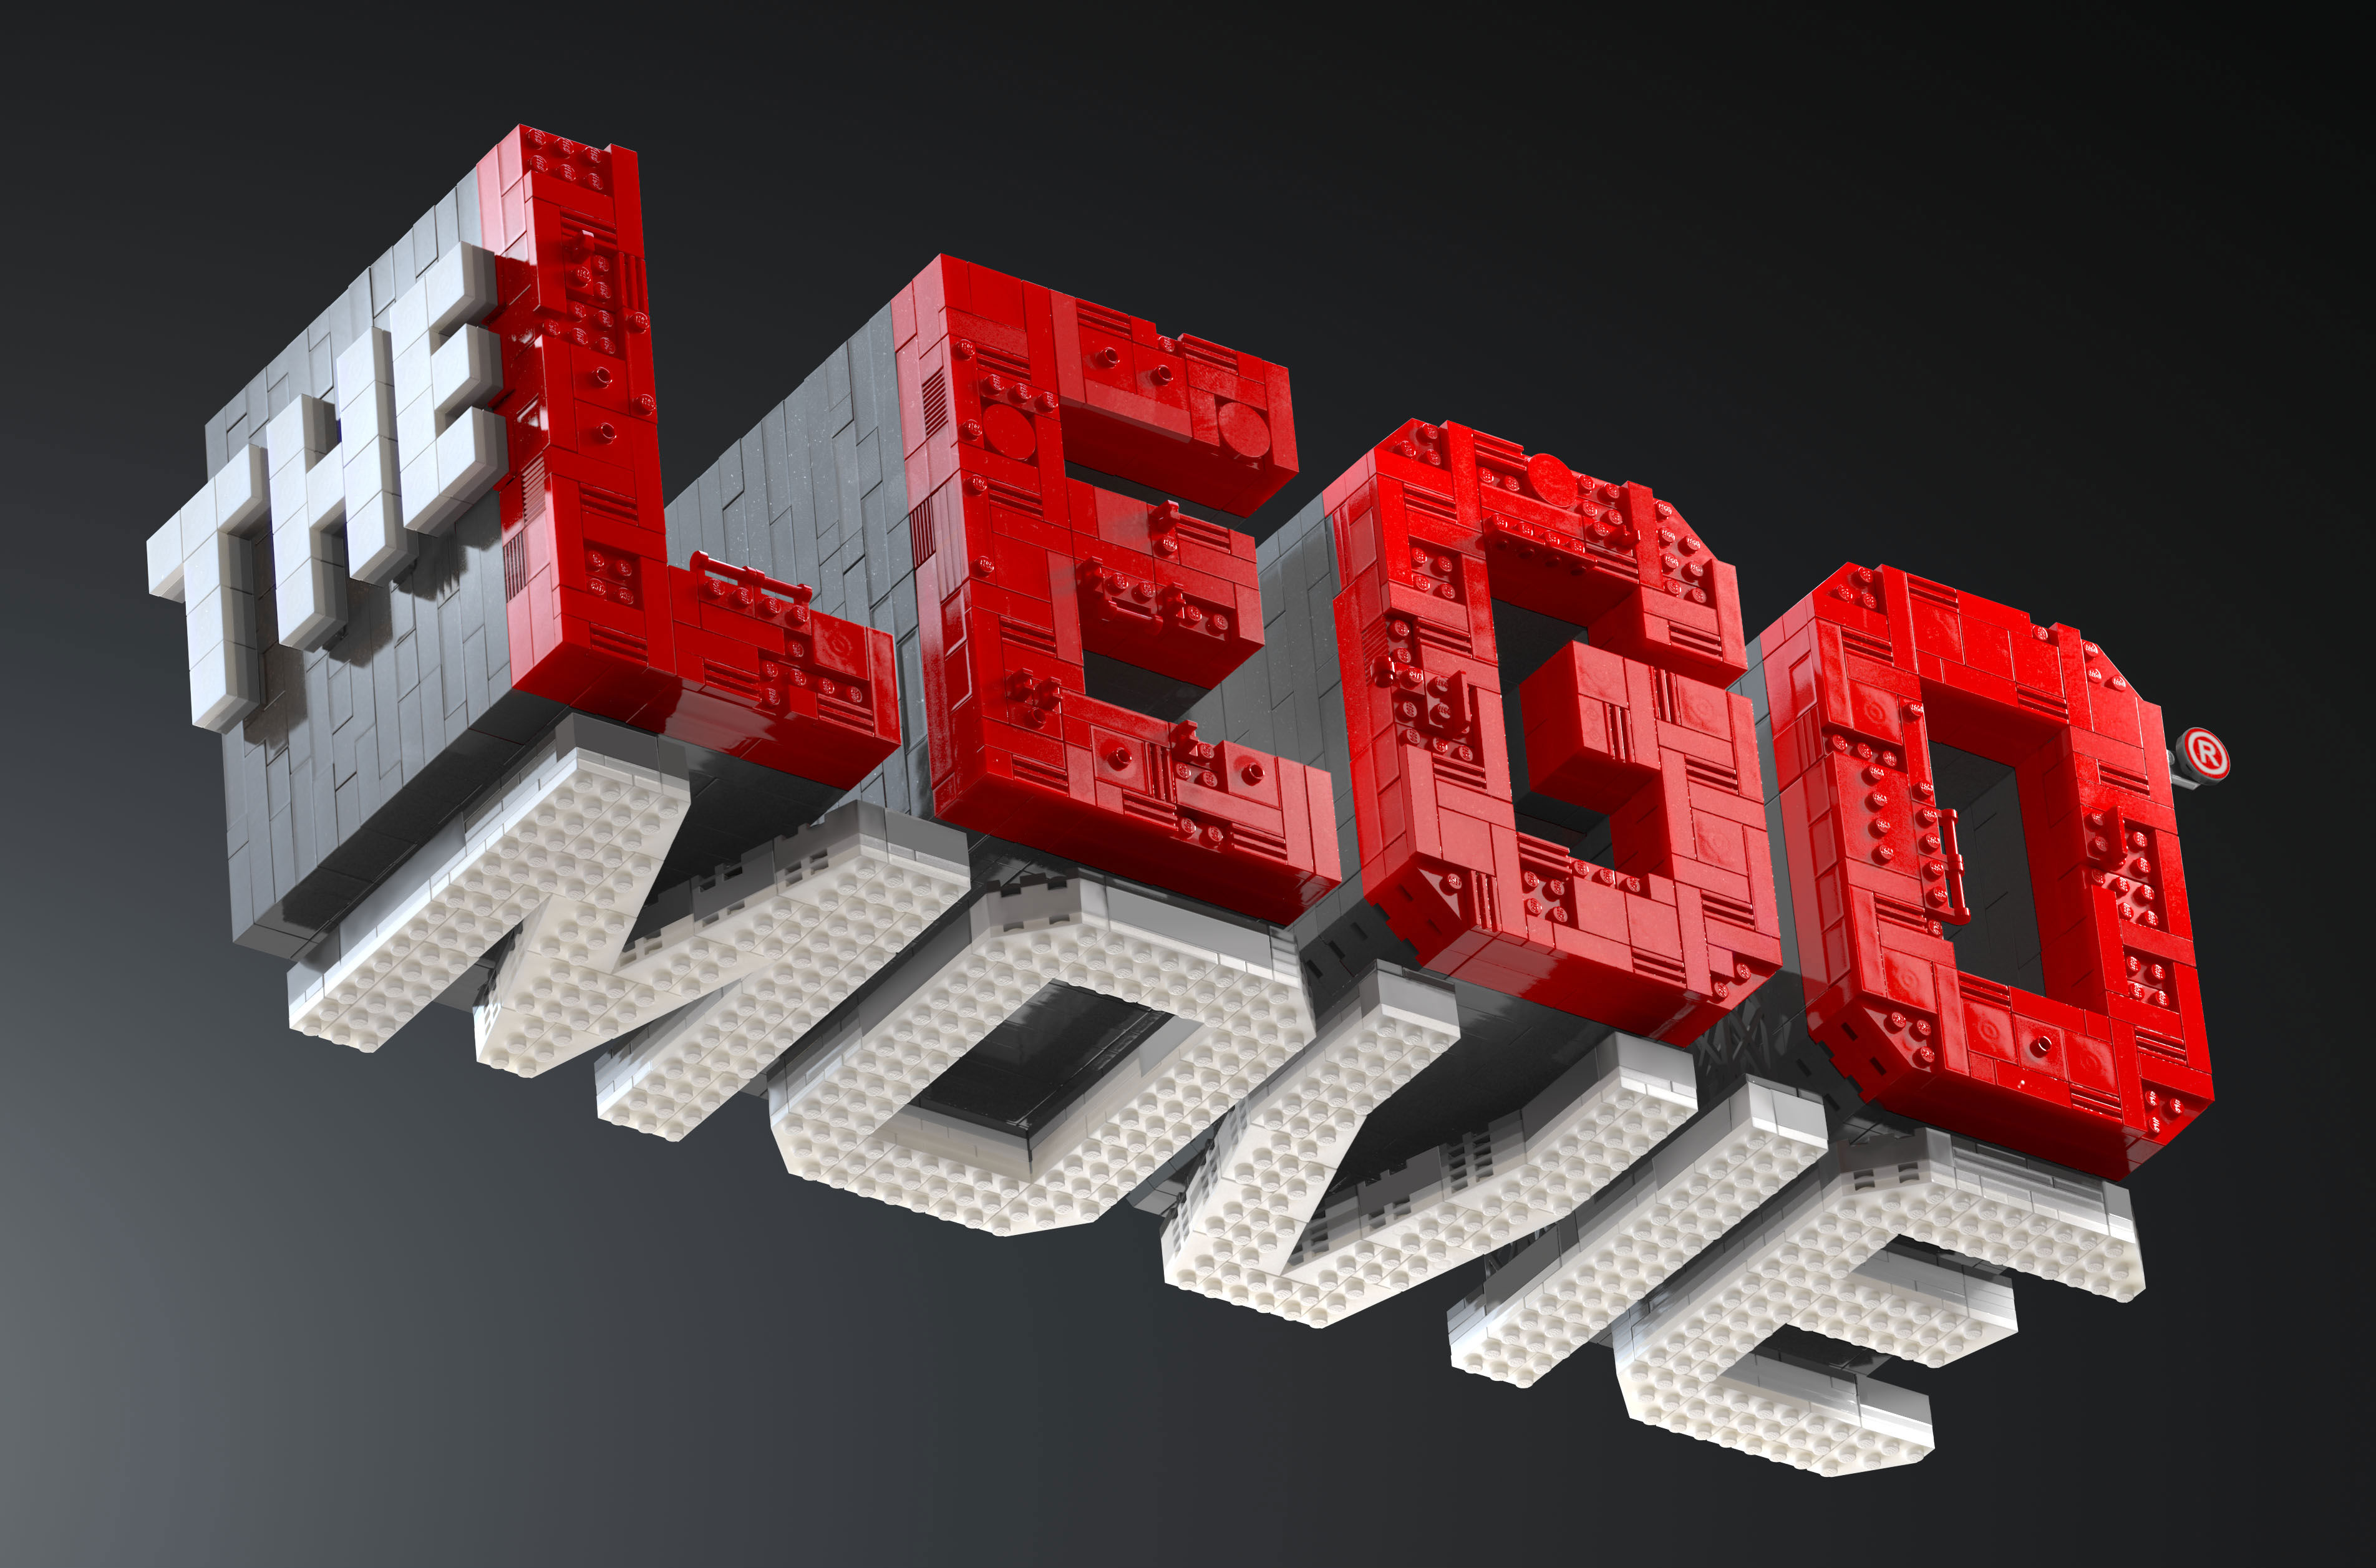 logo pelicula lego